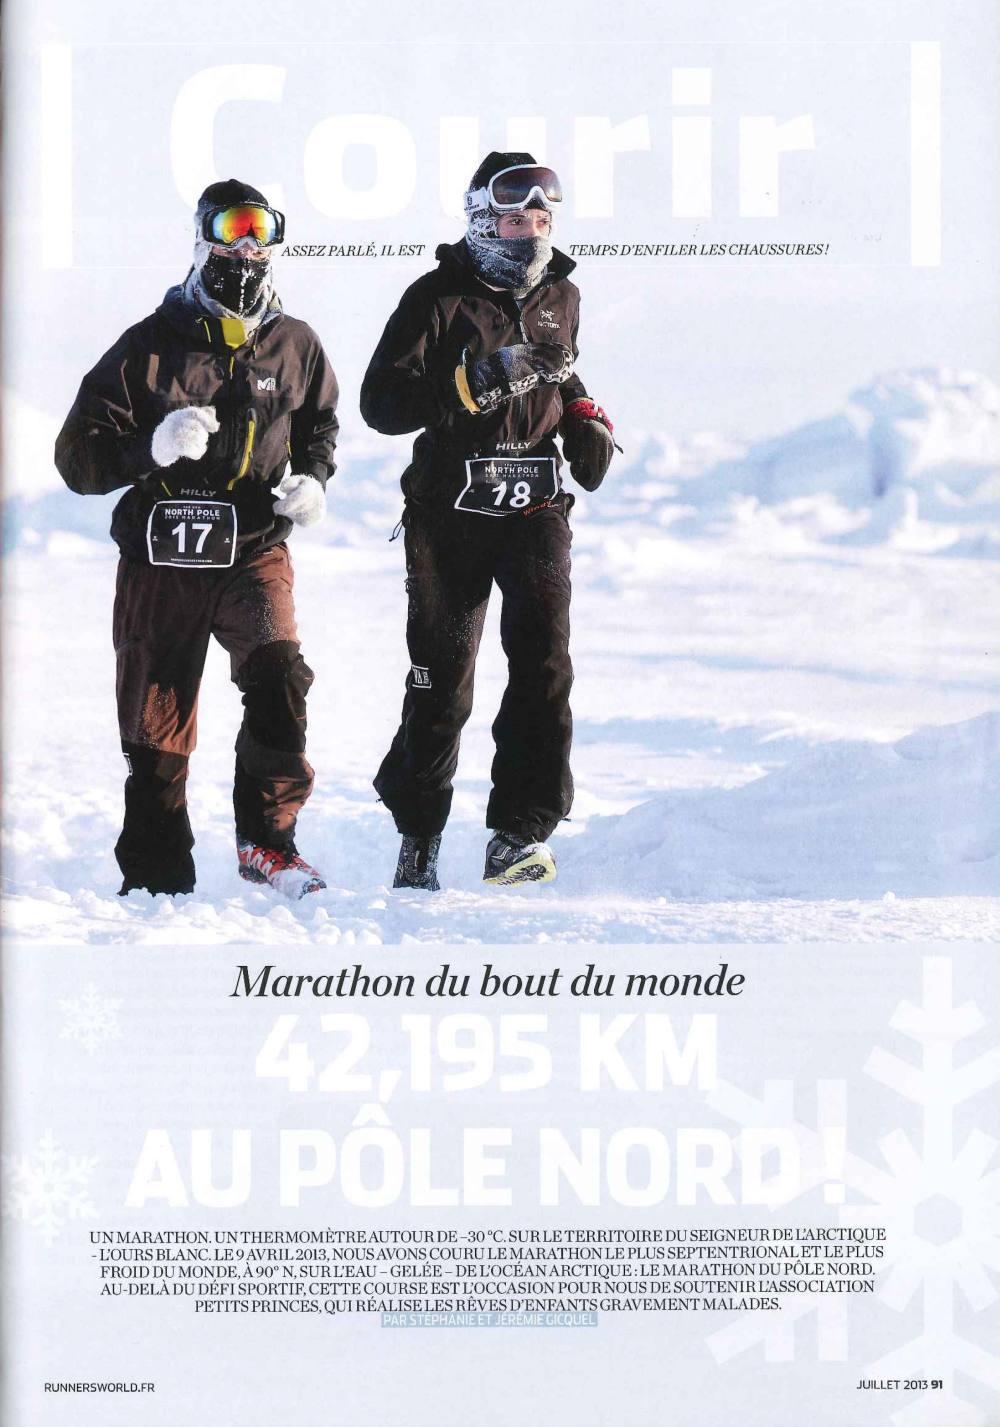 Couverture Runnersworld Stéphanie Gicquel